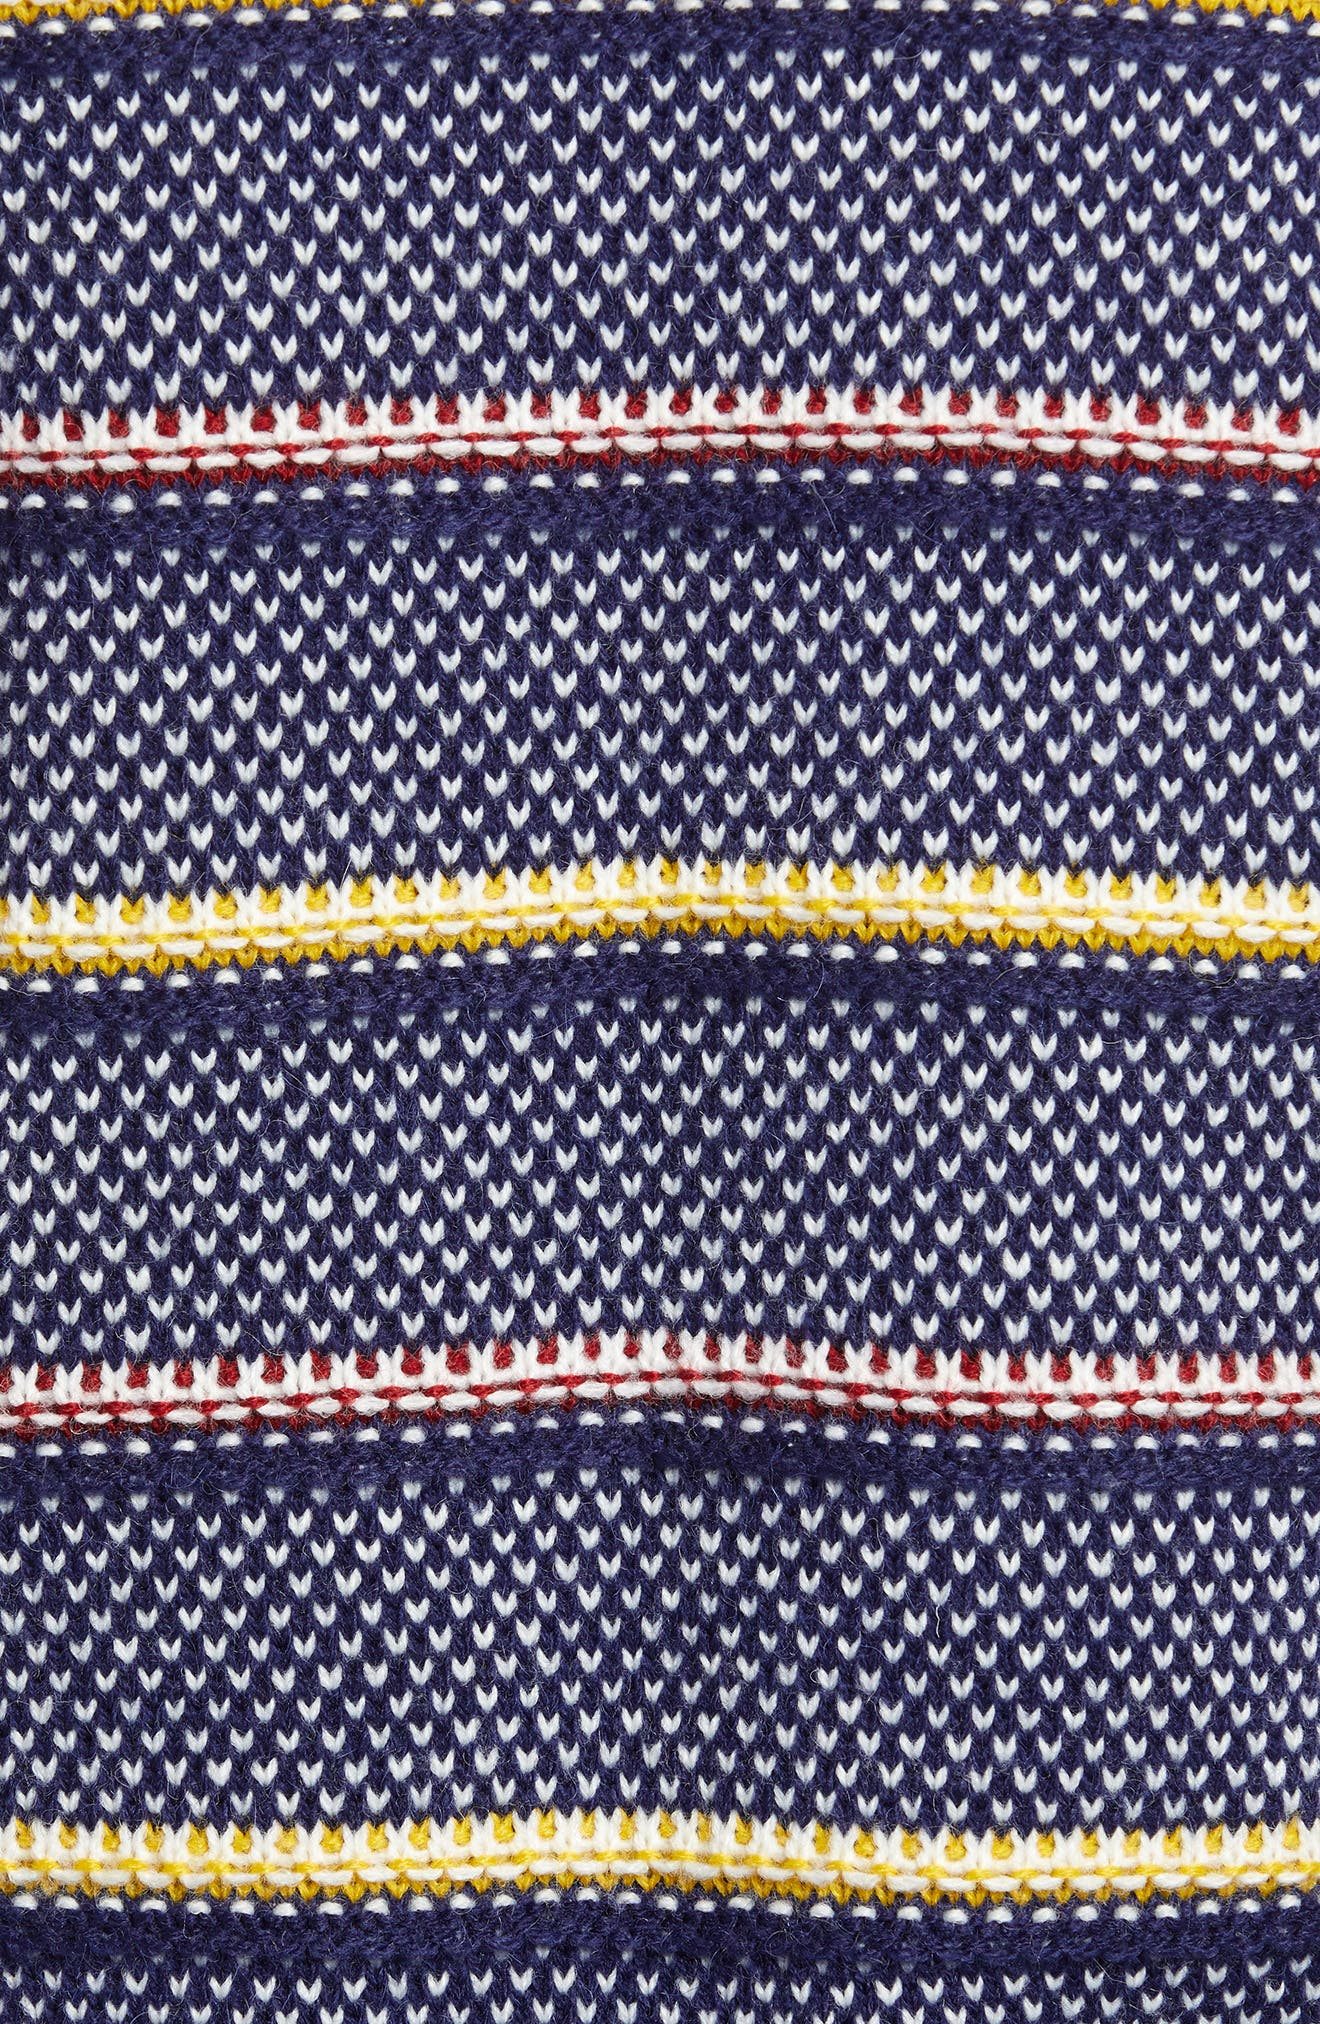 Button Detail Stripe Wool Blend Texture Sweater,                             Alternate thumbnail 5, color,                             NAVY BERET PATTERN